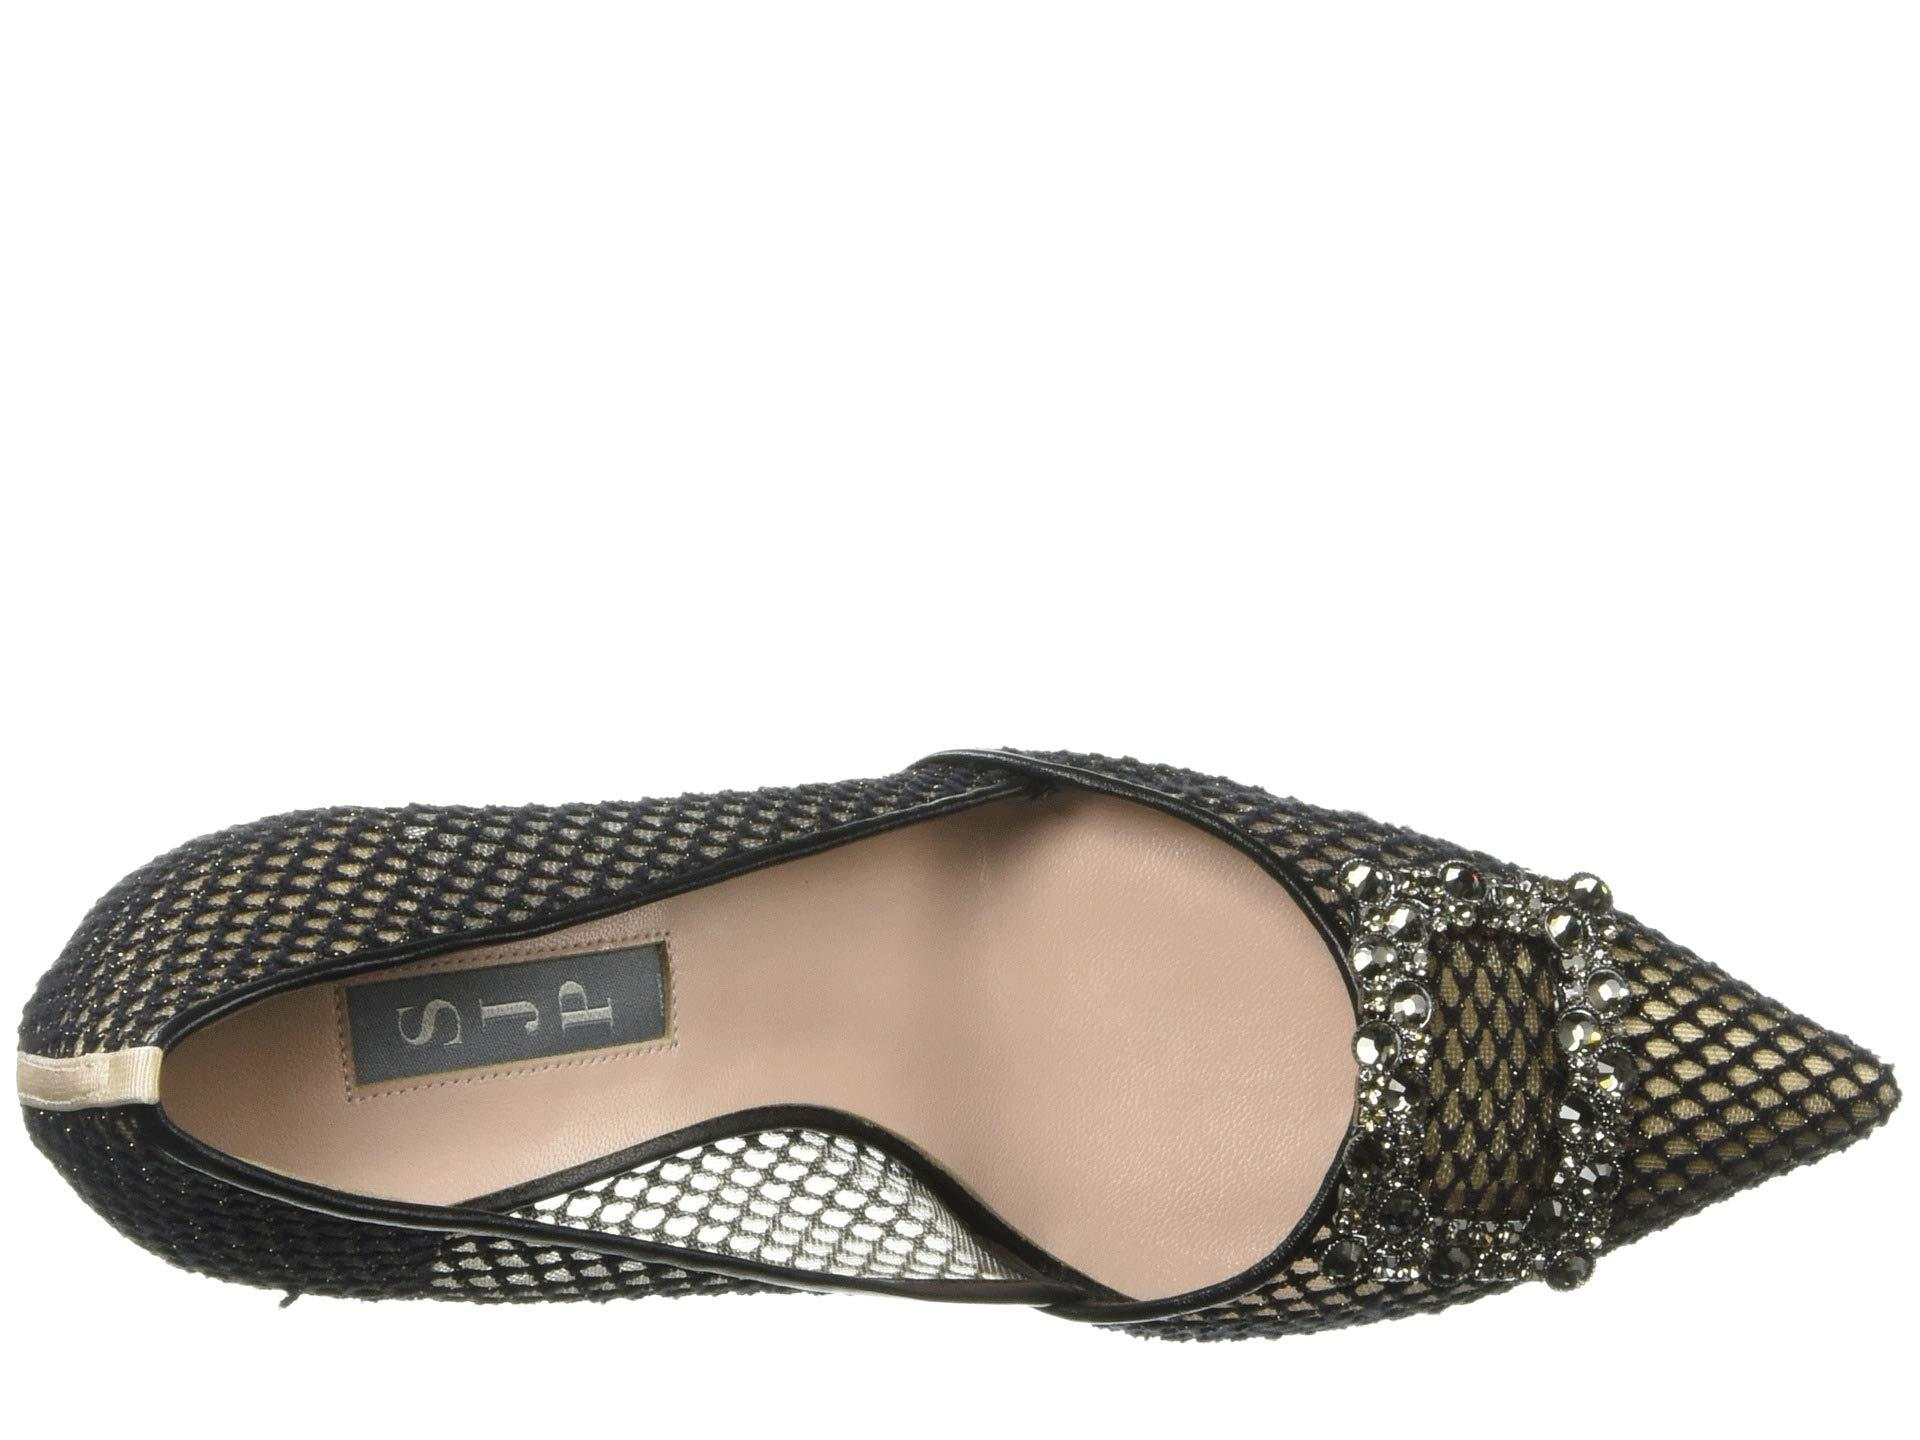 e2c2de890bc5 SJP by Sarah Jessica Parker - Windsor (black Habana Mesh) Women s Shoes -  Lyst. View fullscreen